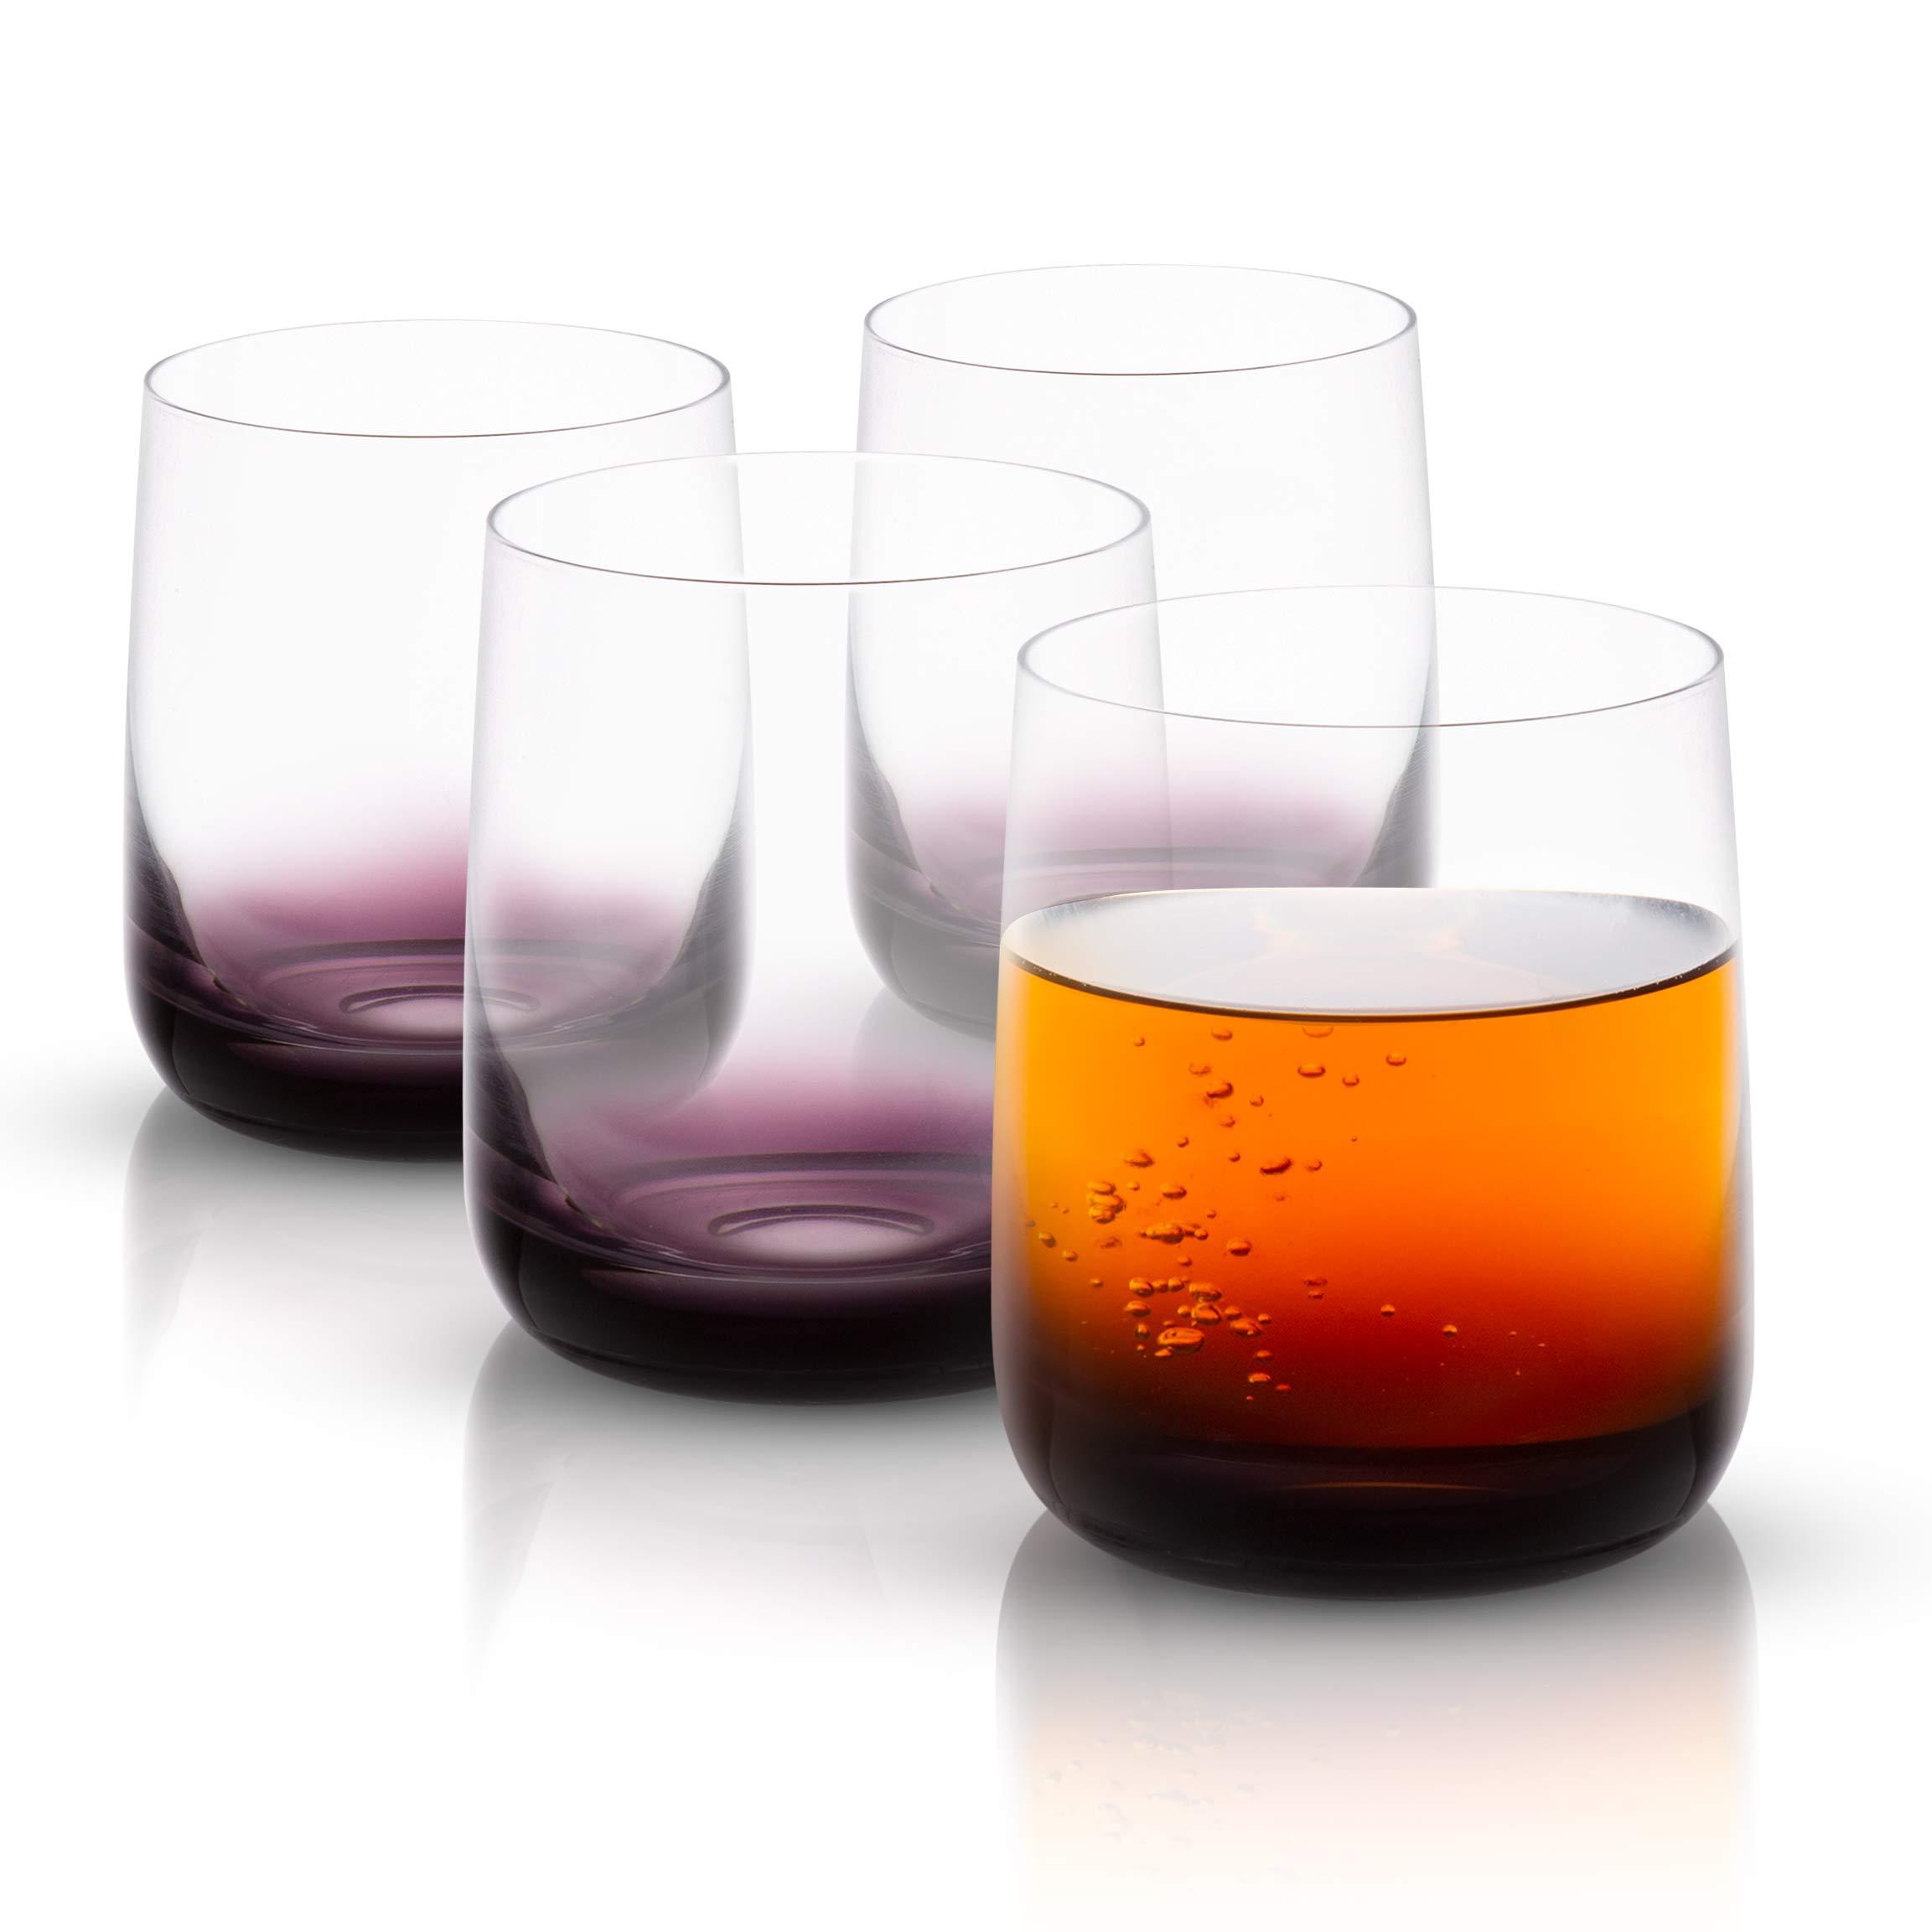 JoyJolt Black Swan Collection Glassware (DOF Glasses)